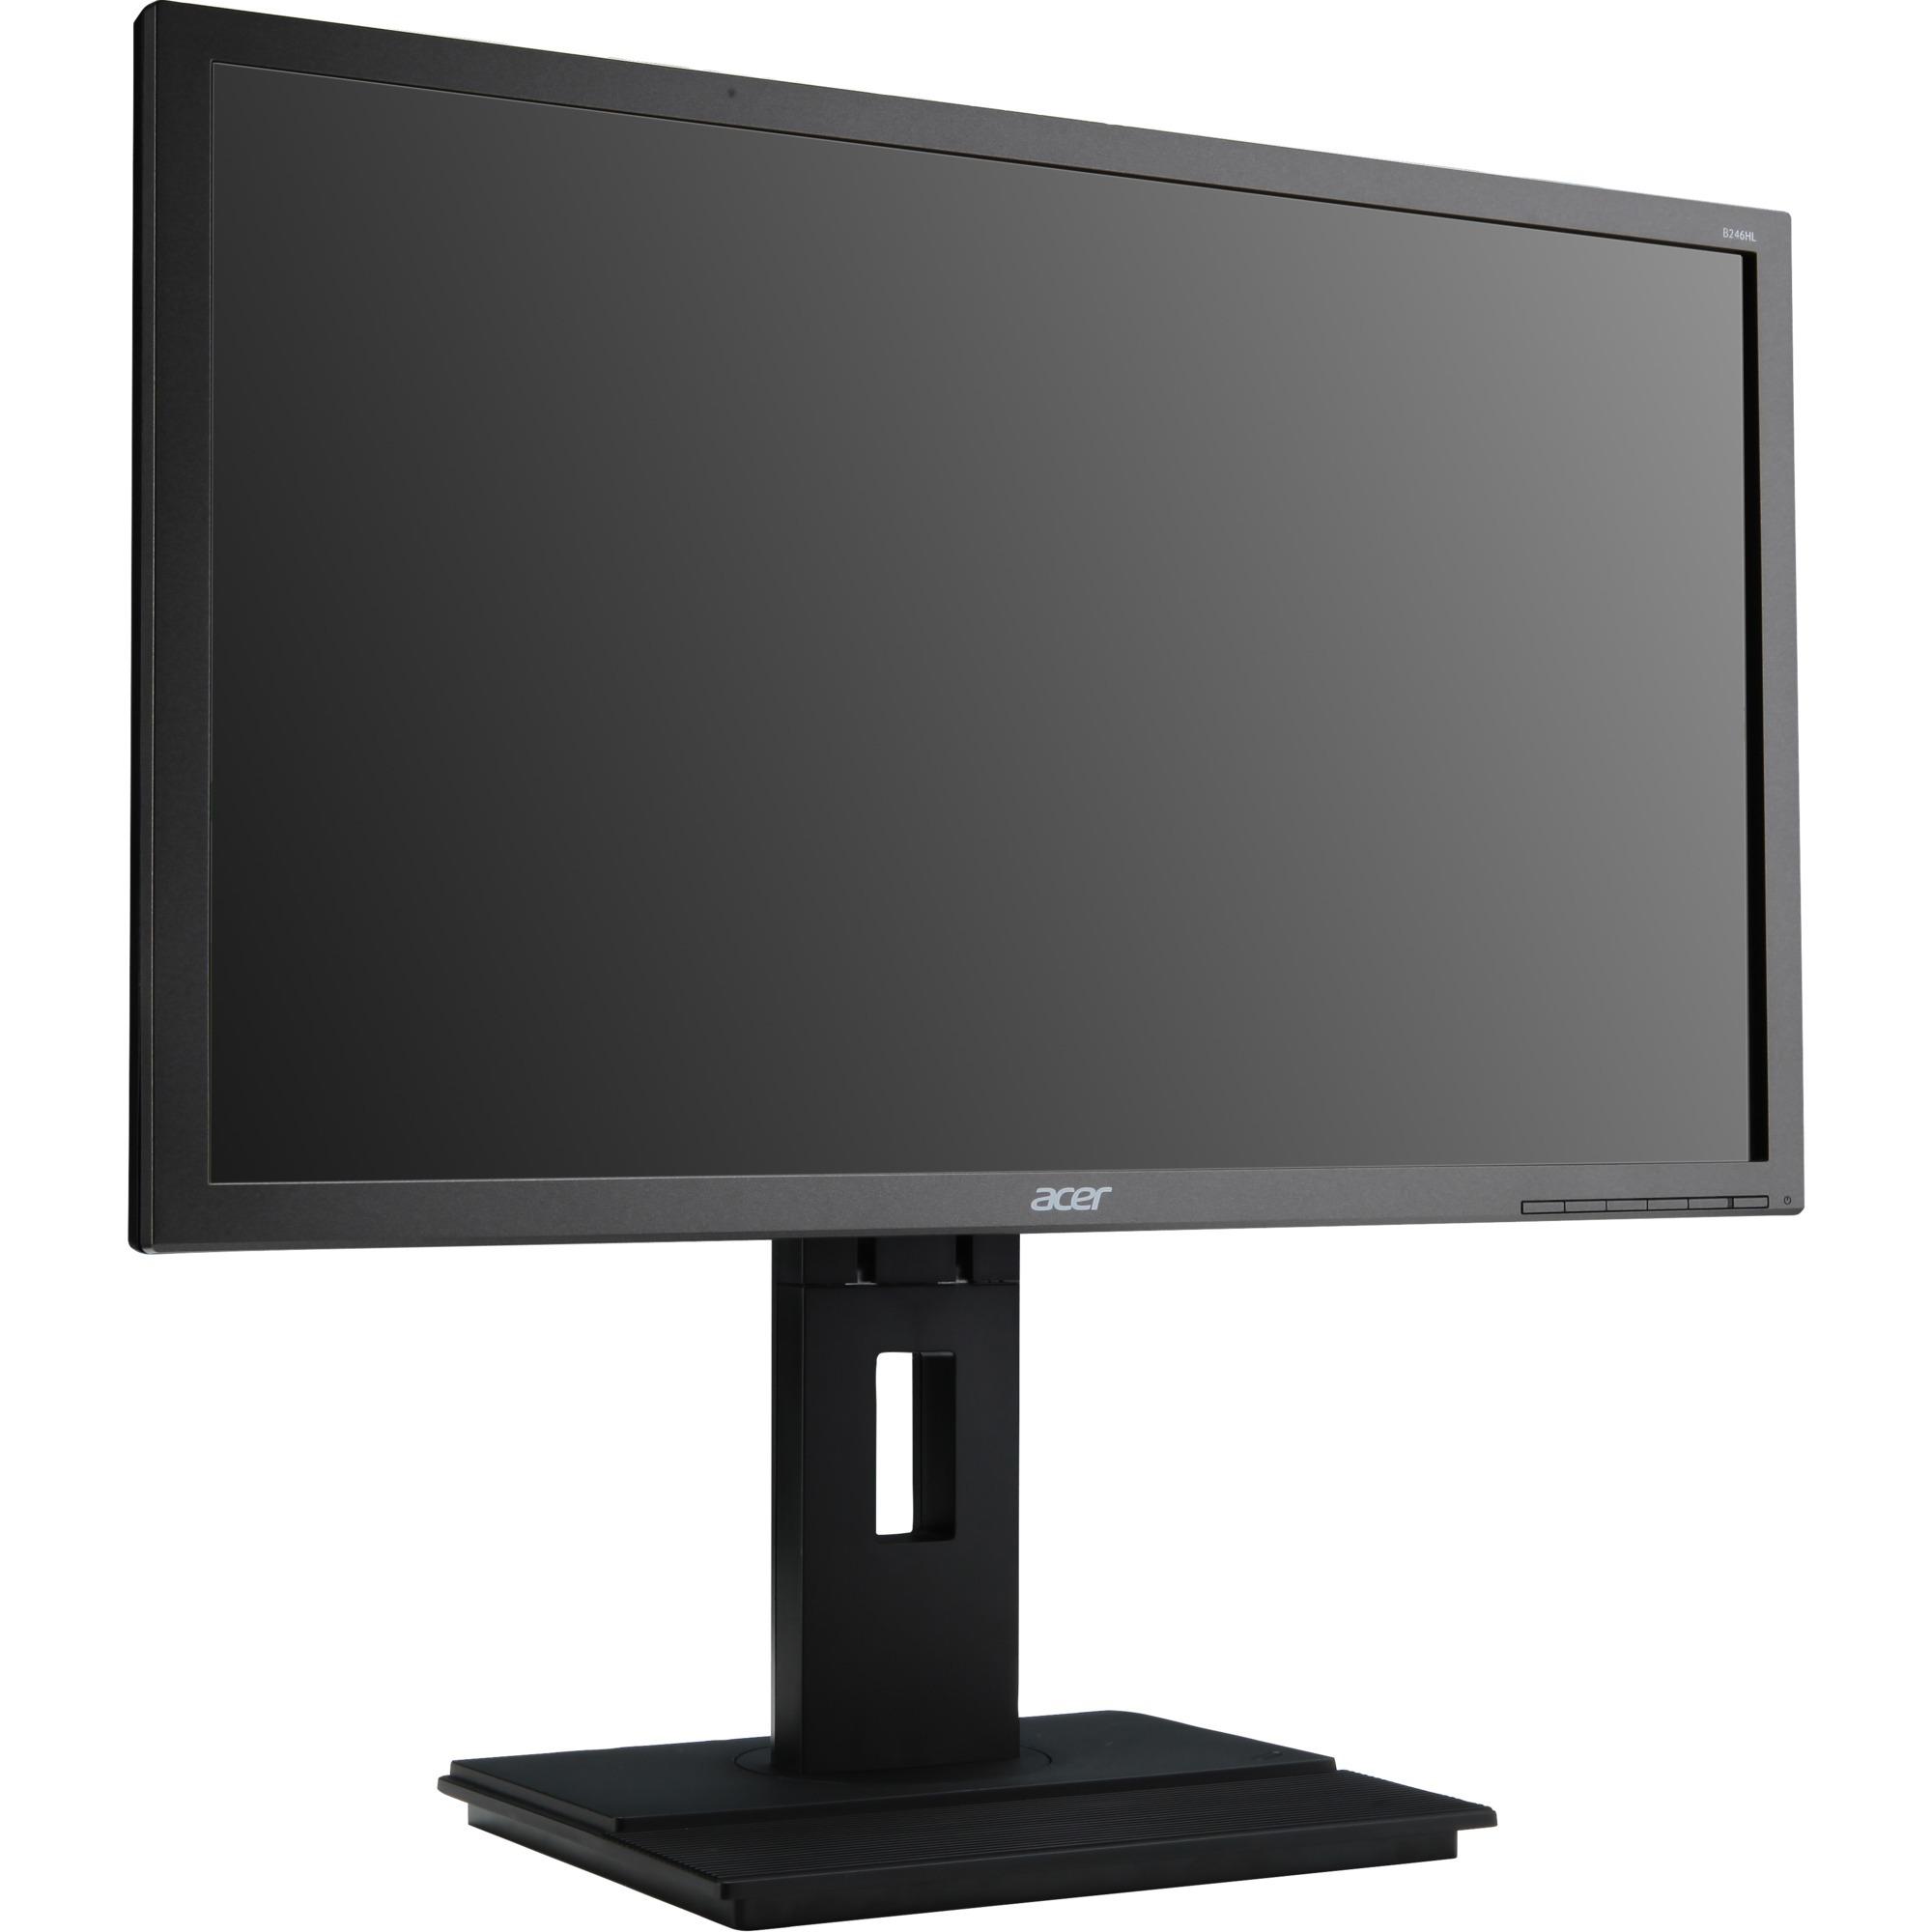 "B6 B246WLbmdprx pantalla para PC 61 cm (24"") WUXGA LED Plana Gris, Monitor LED"